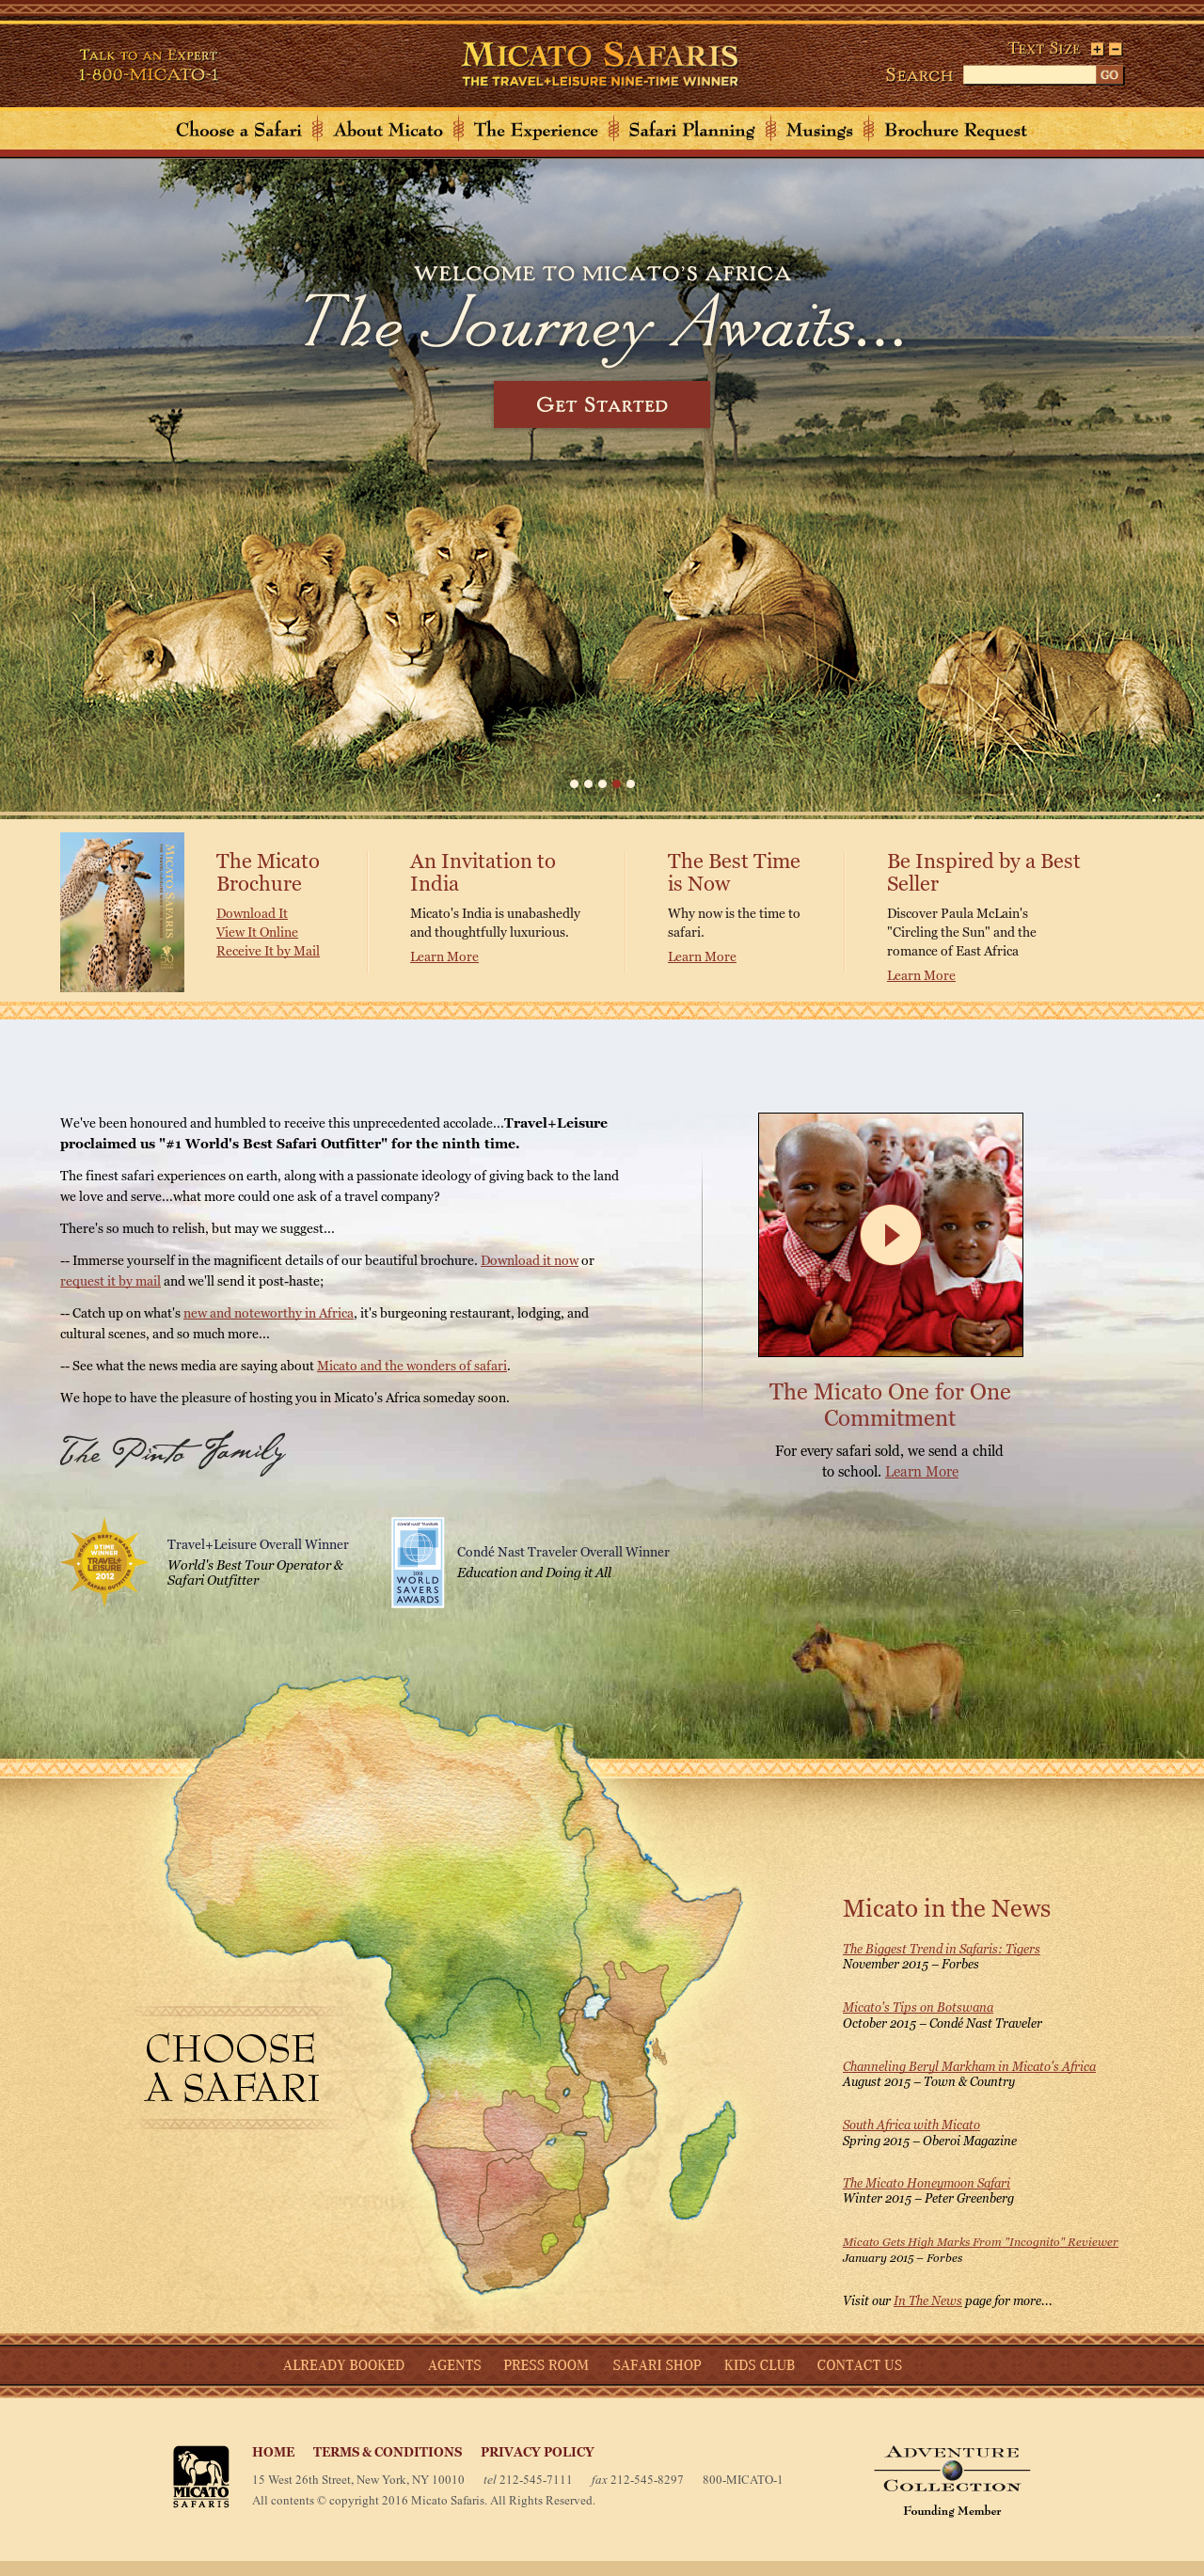 Micato Safaris Competitors, Revenue and Employees - Owler